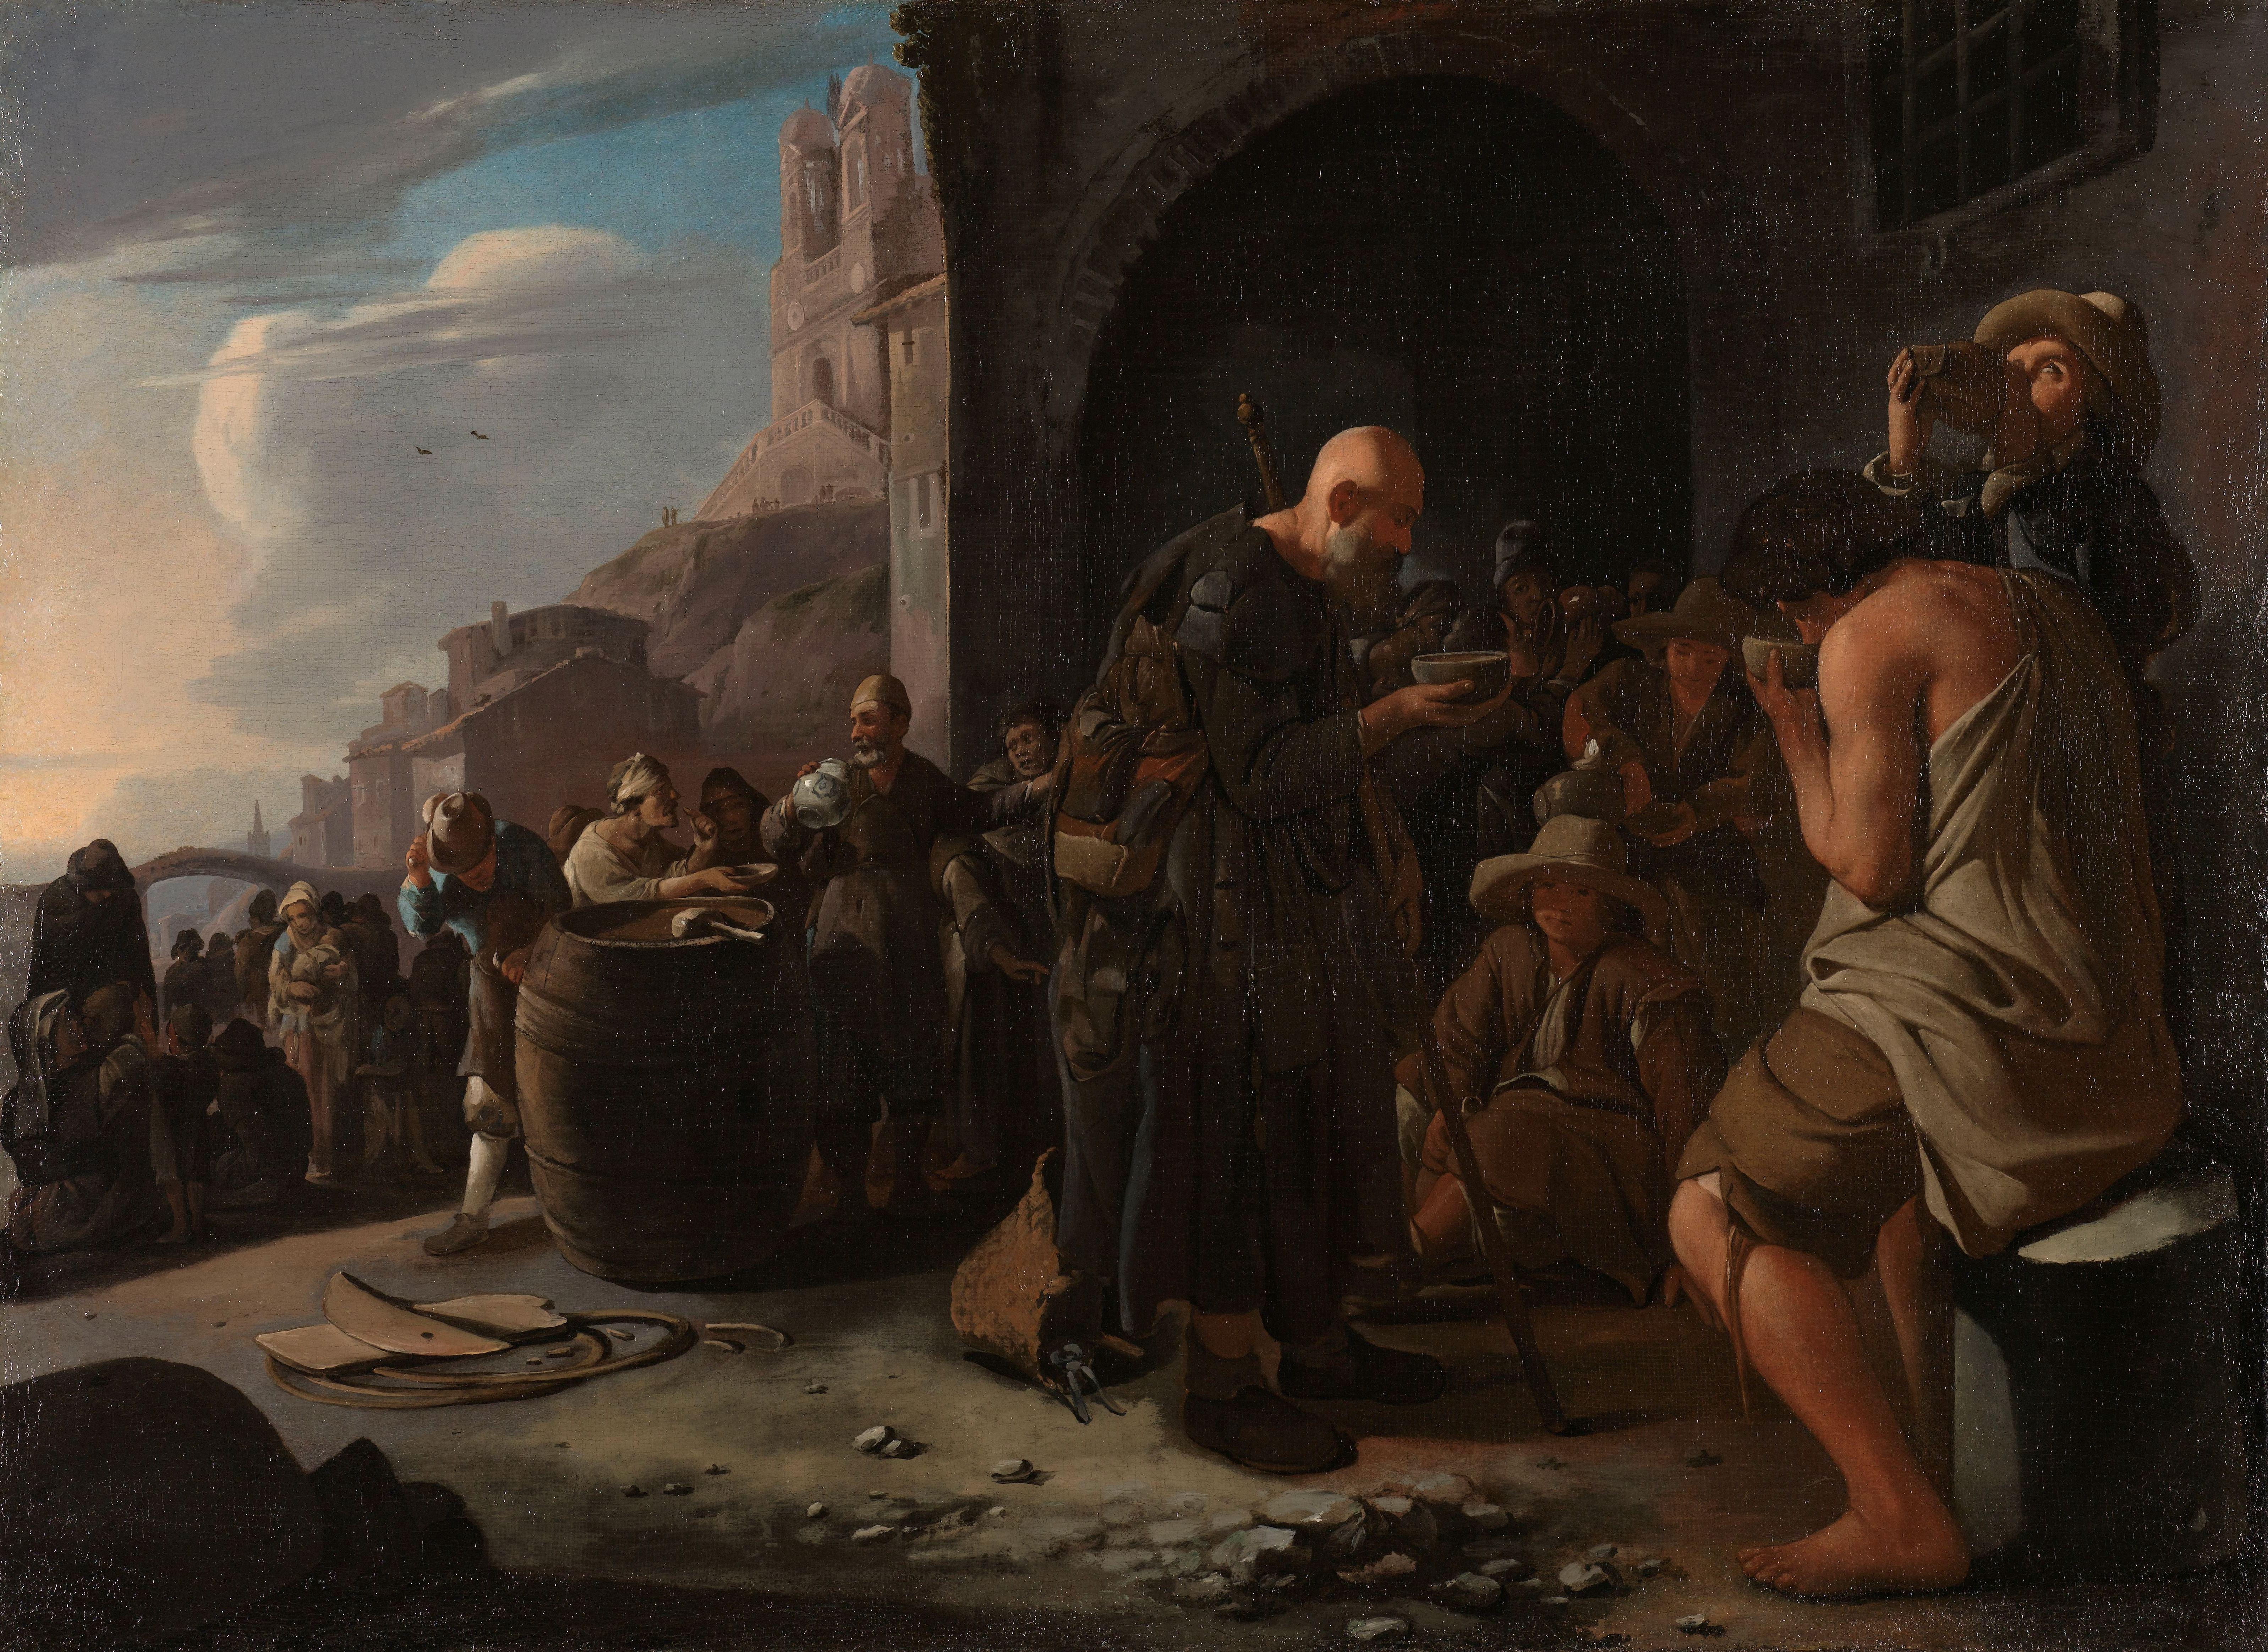 File:De dorstigen laven Rijksmuseum SK-A-2846 jpeg